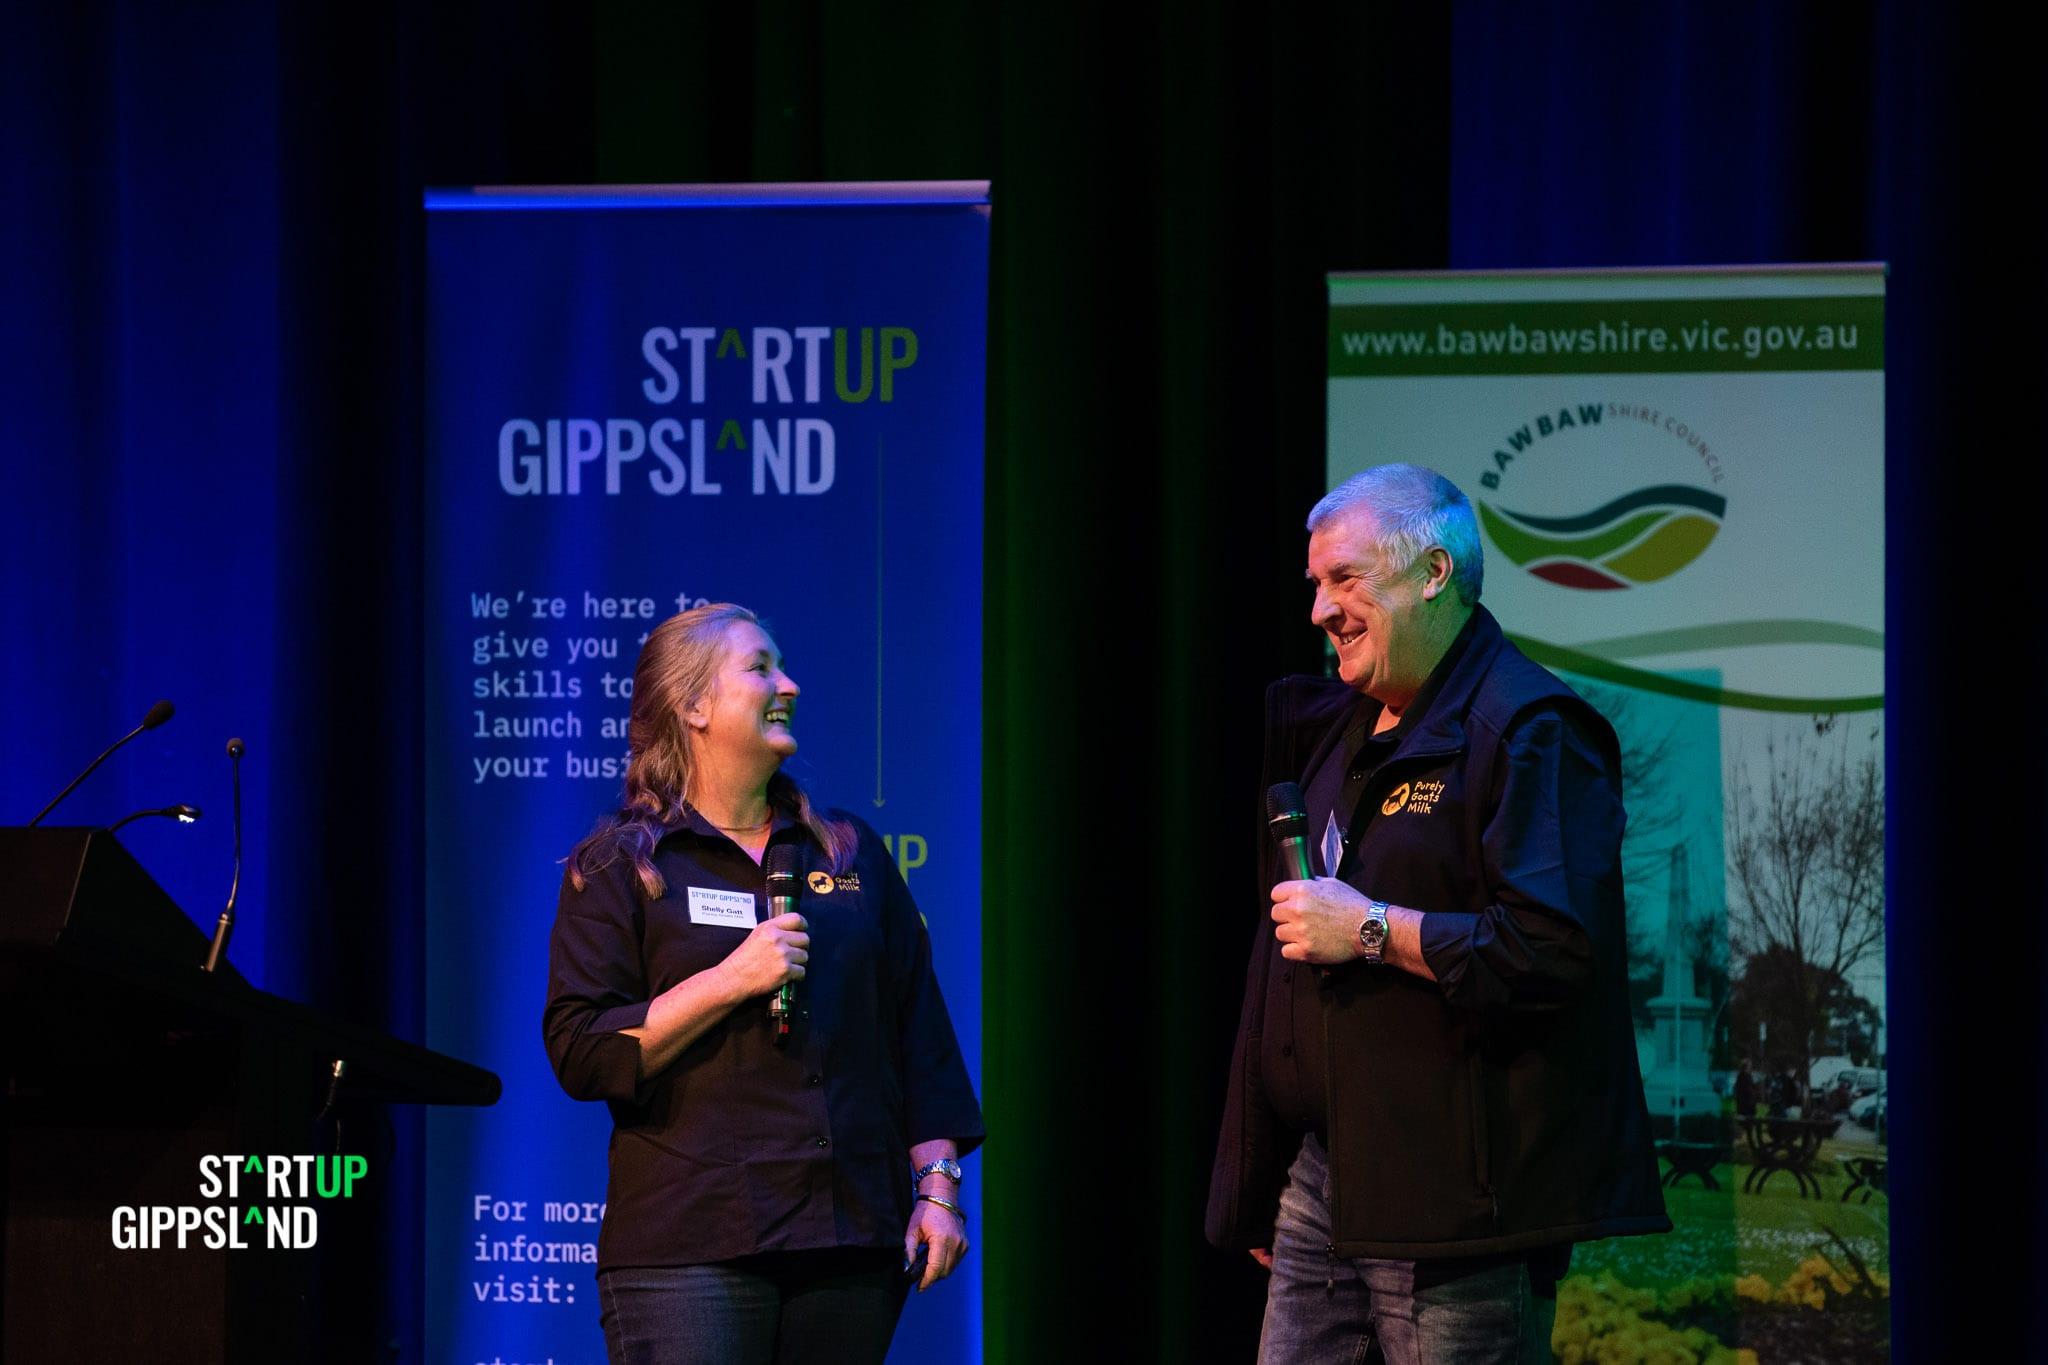 Startup Gippsland Photo Gallery Showcase Purely Goats Milk